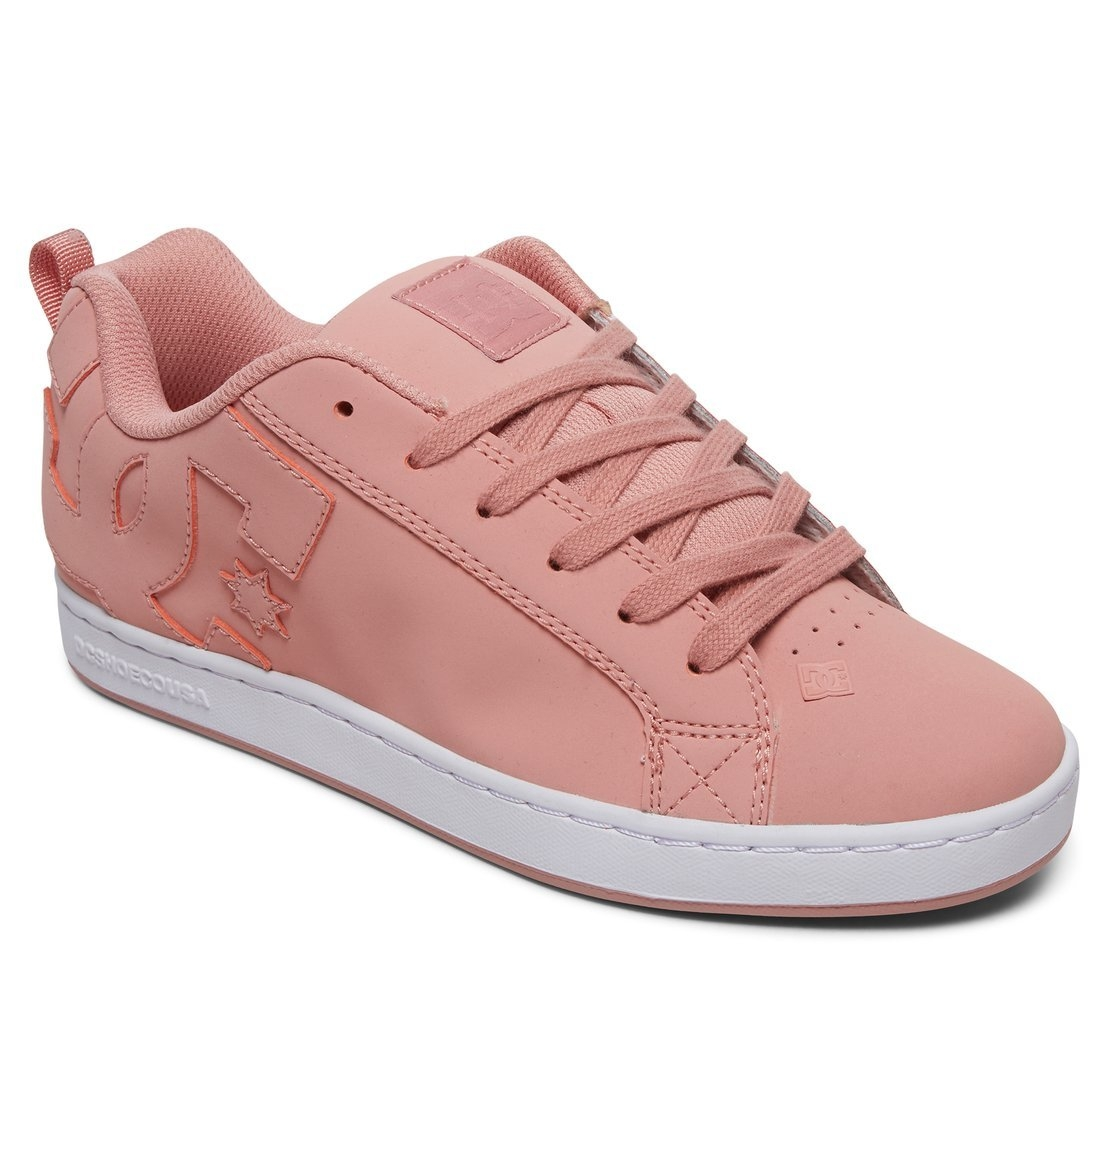 DC Shoes Schoenen »Court Graffik« veilig op otto.nl kopen